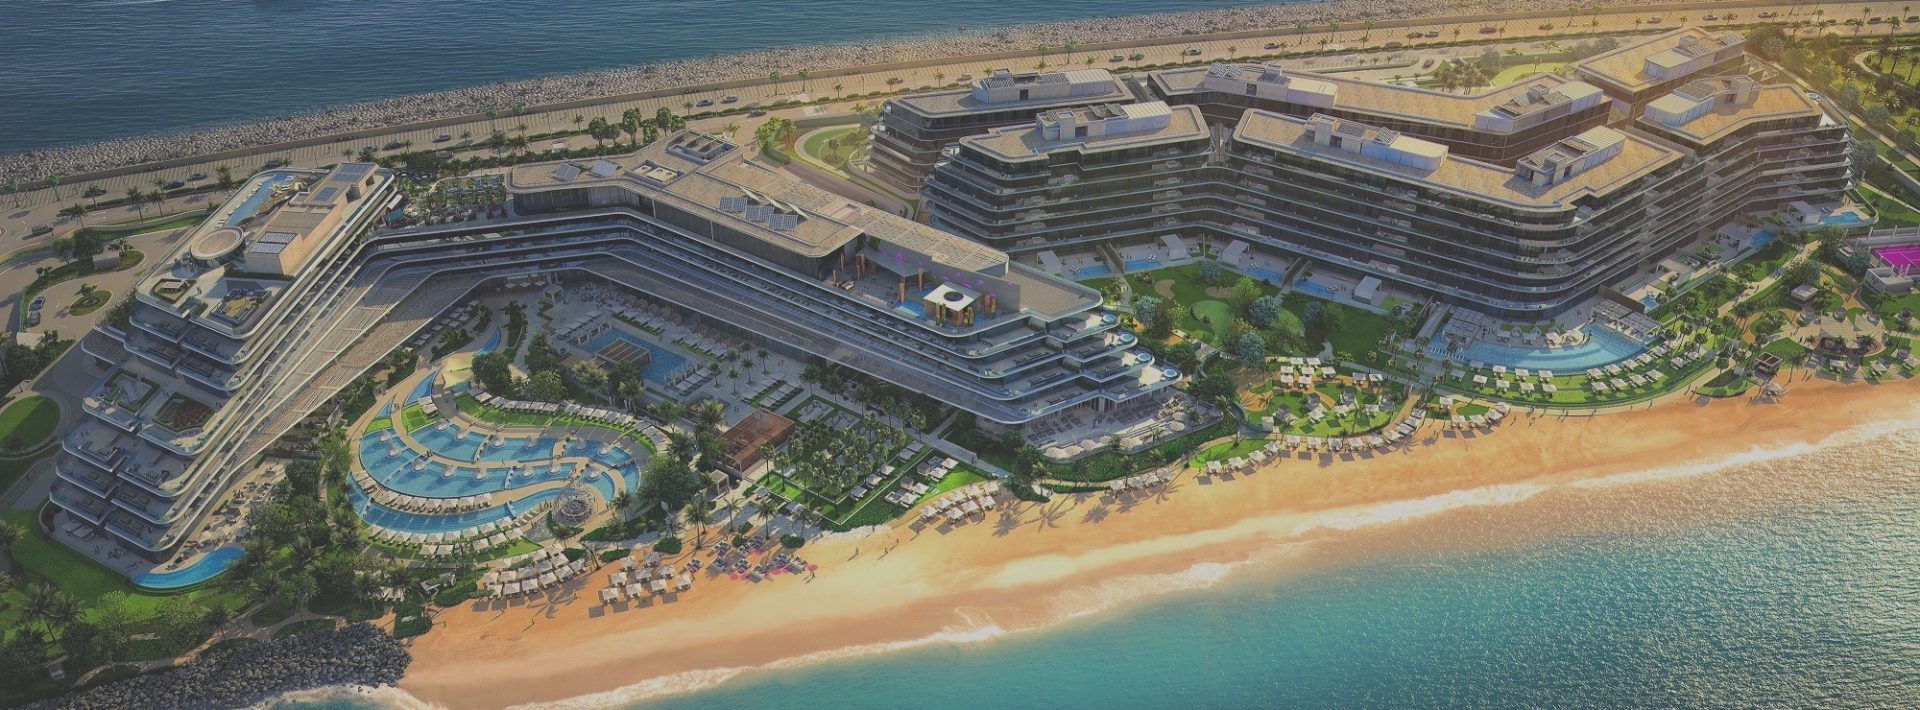 W_Dubai_-_The_Palm_aerial_new_LOW_RES11